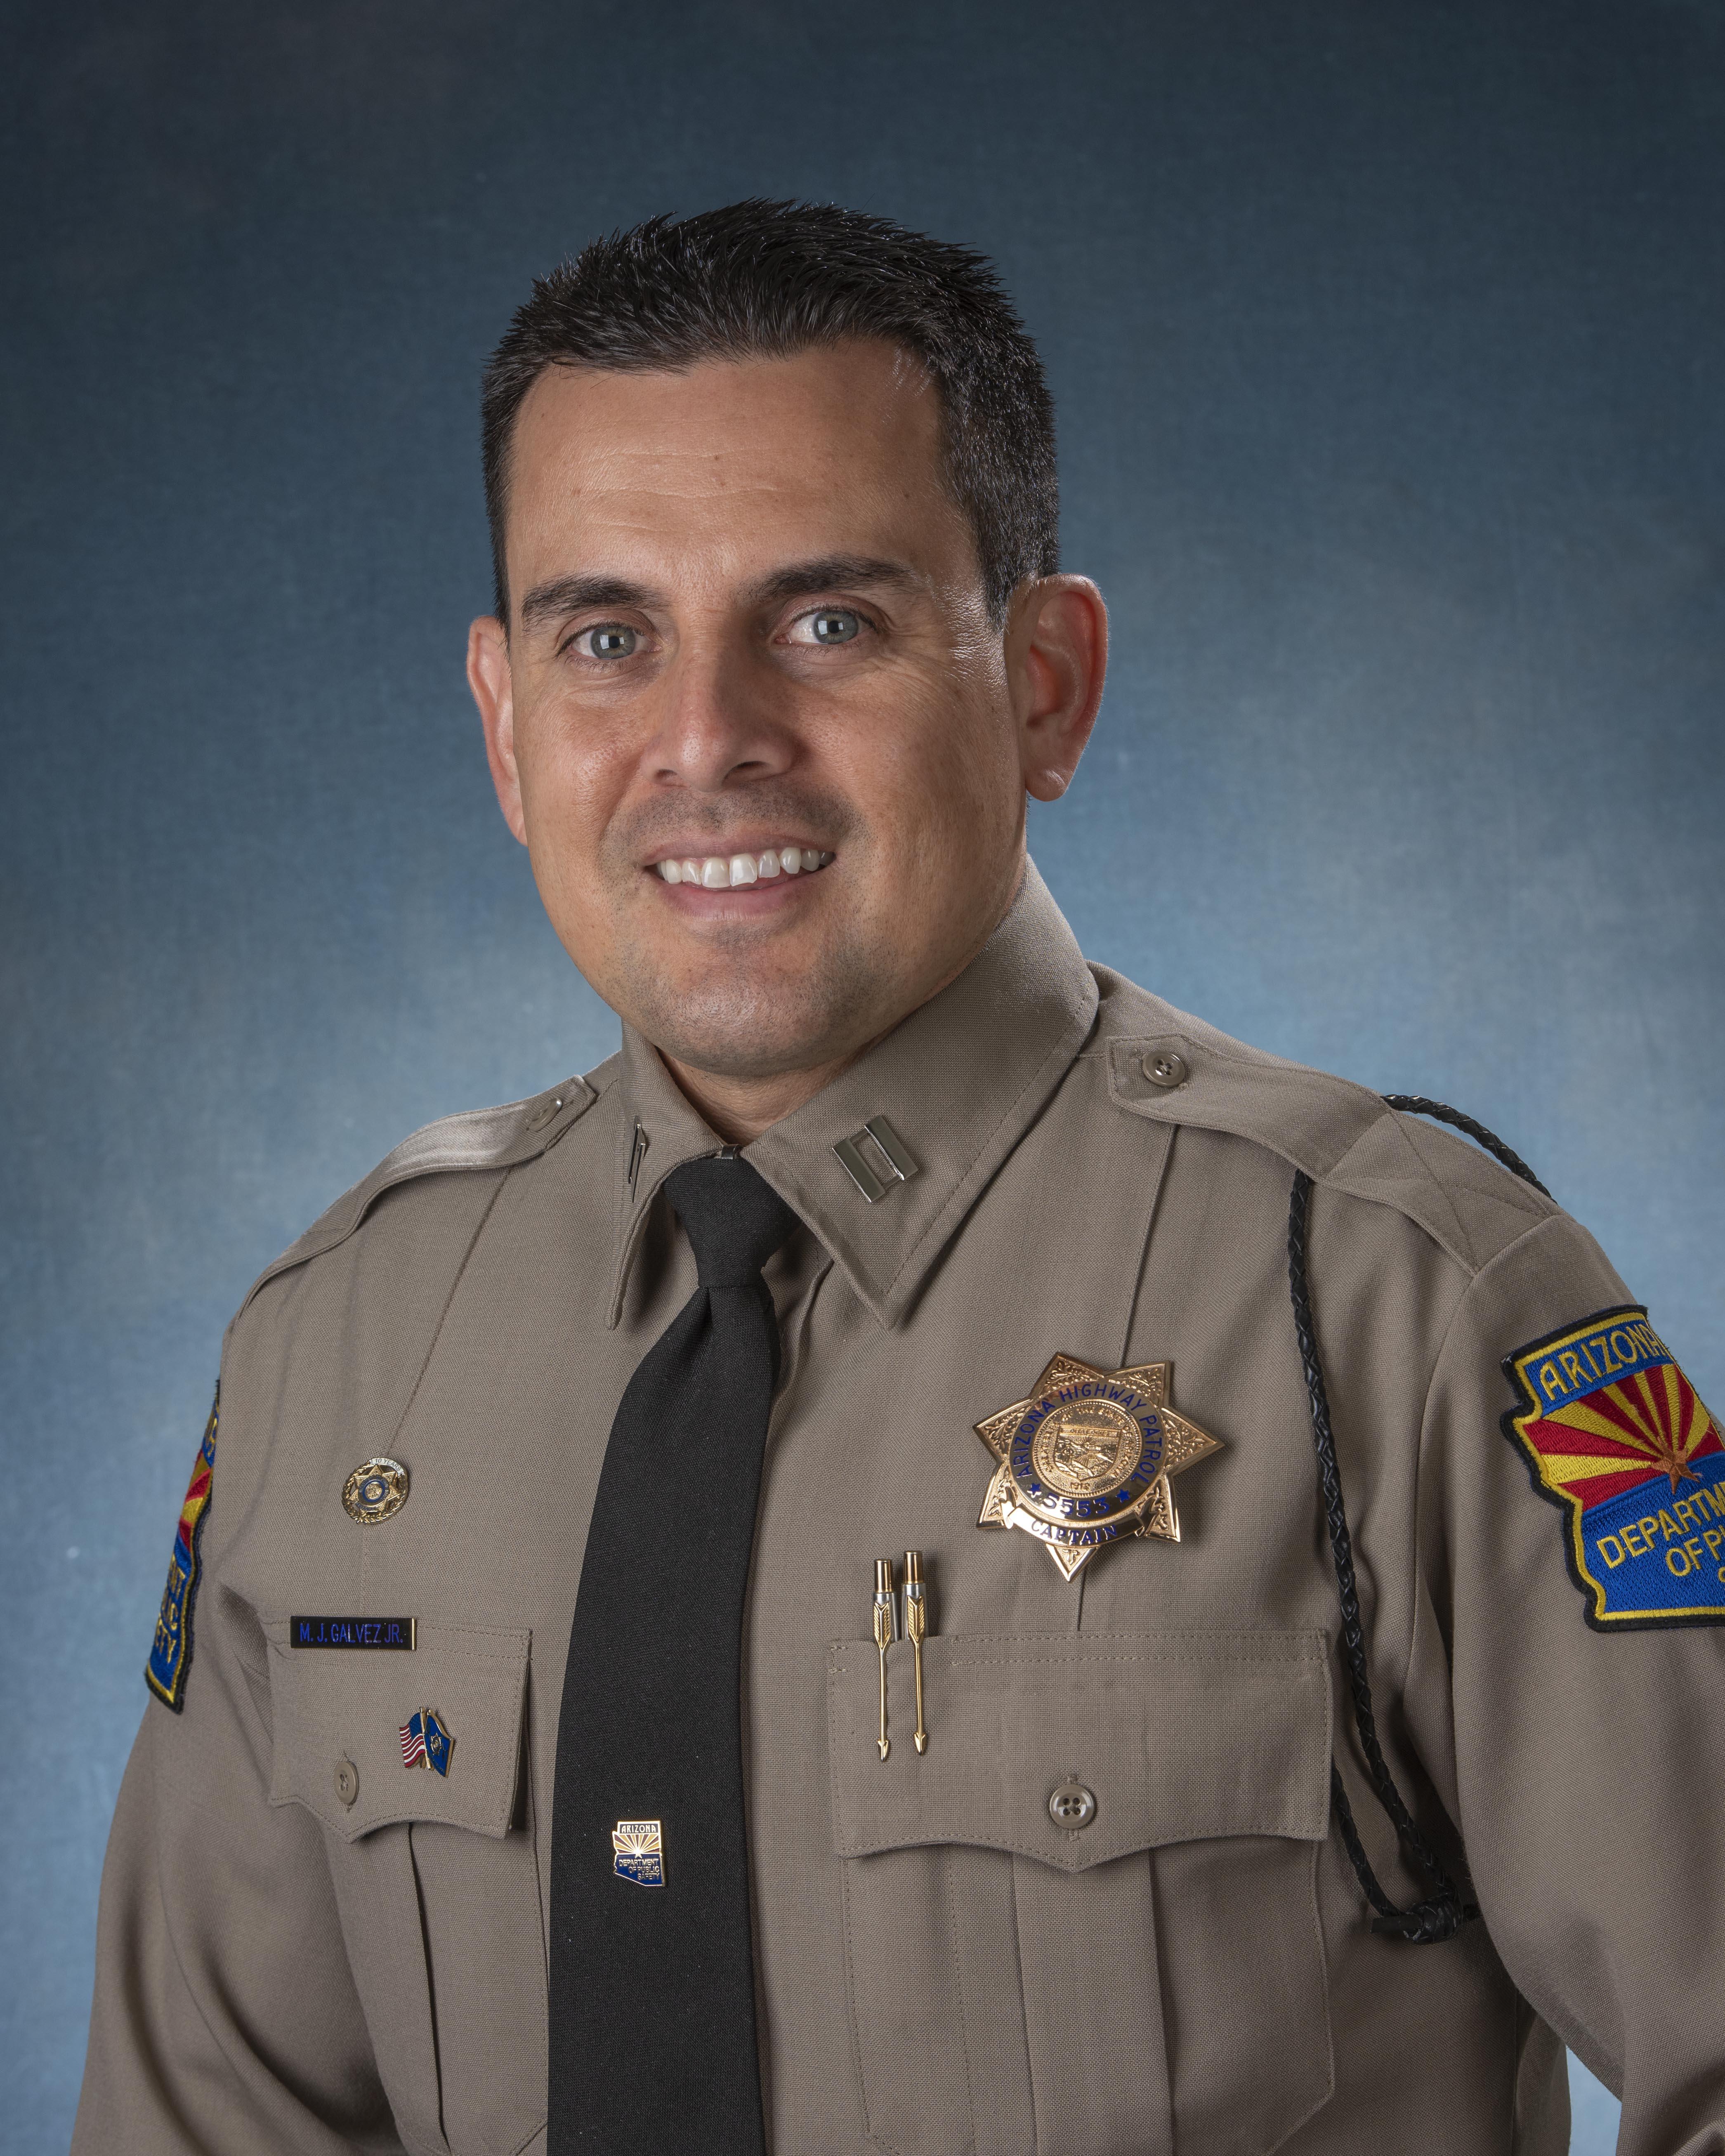 Capt. Jesse Galvez